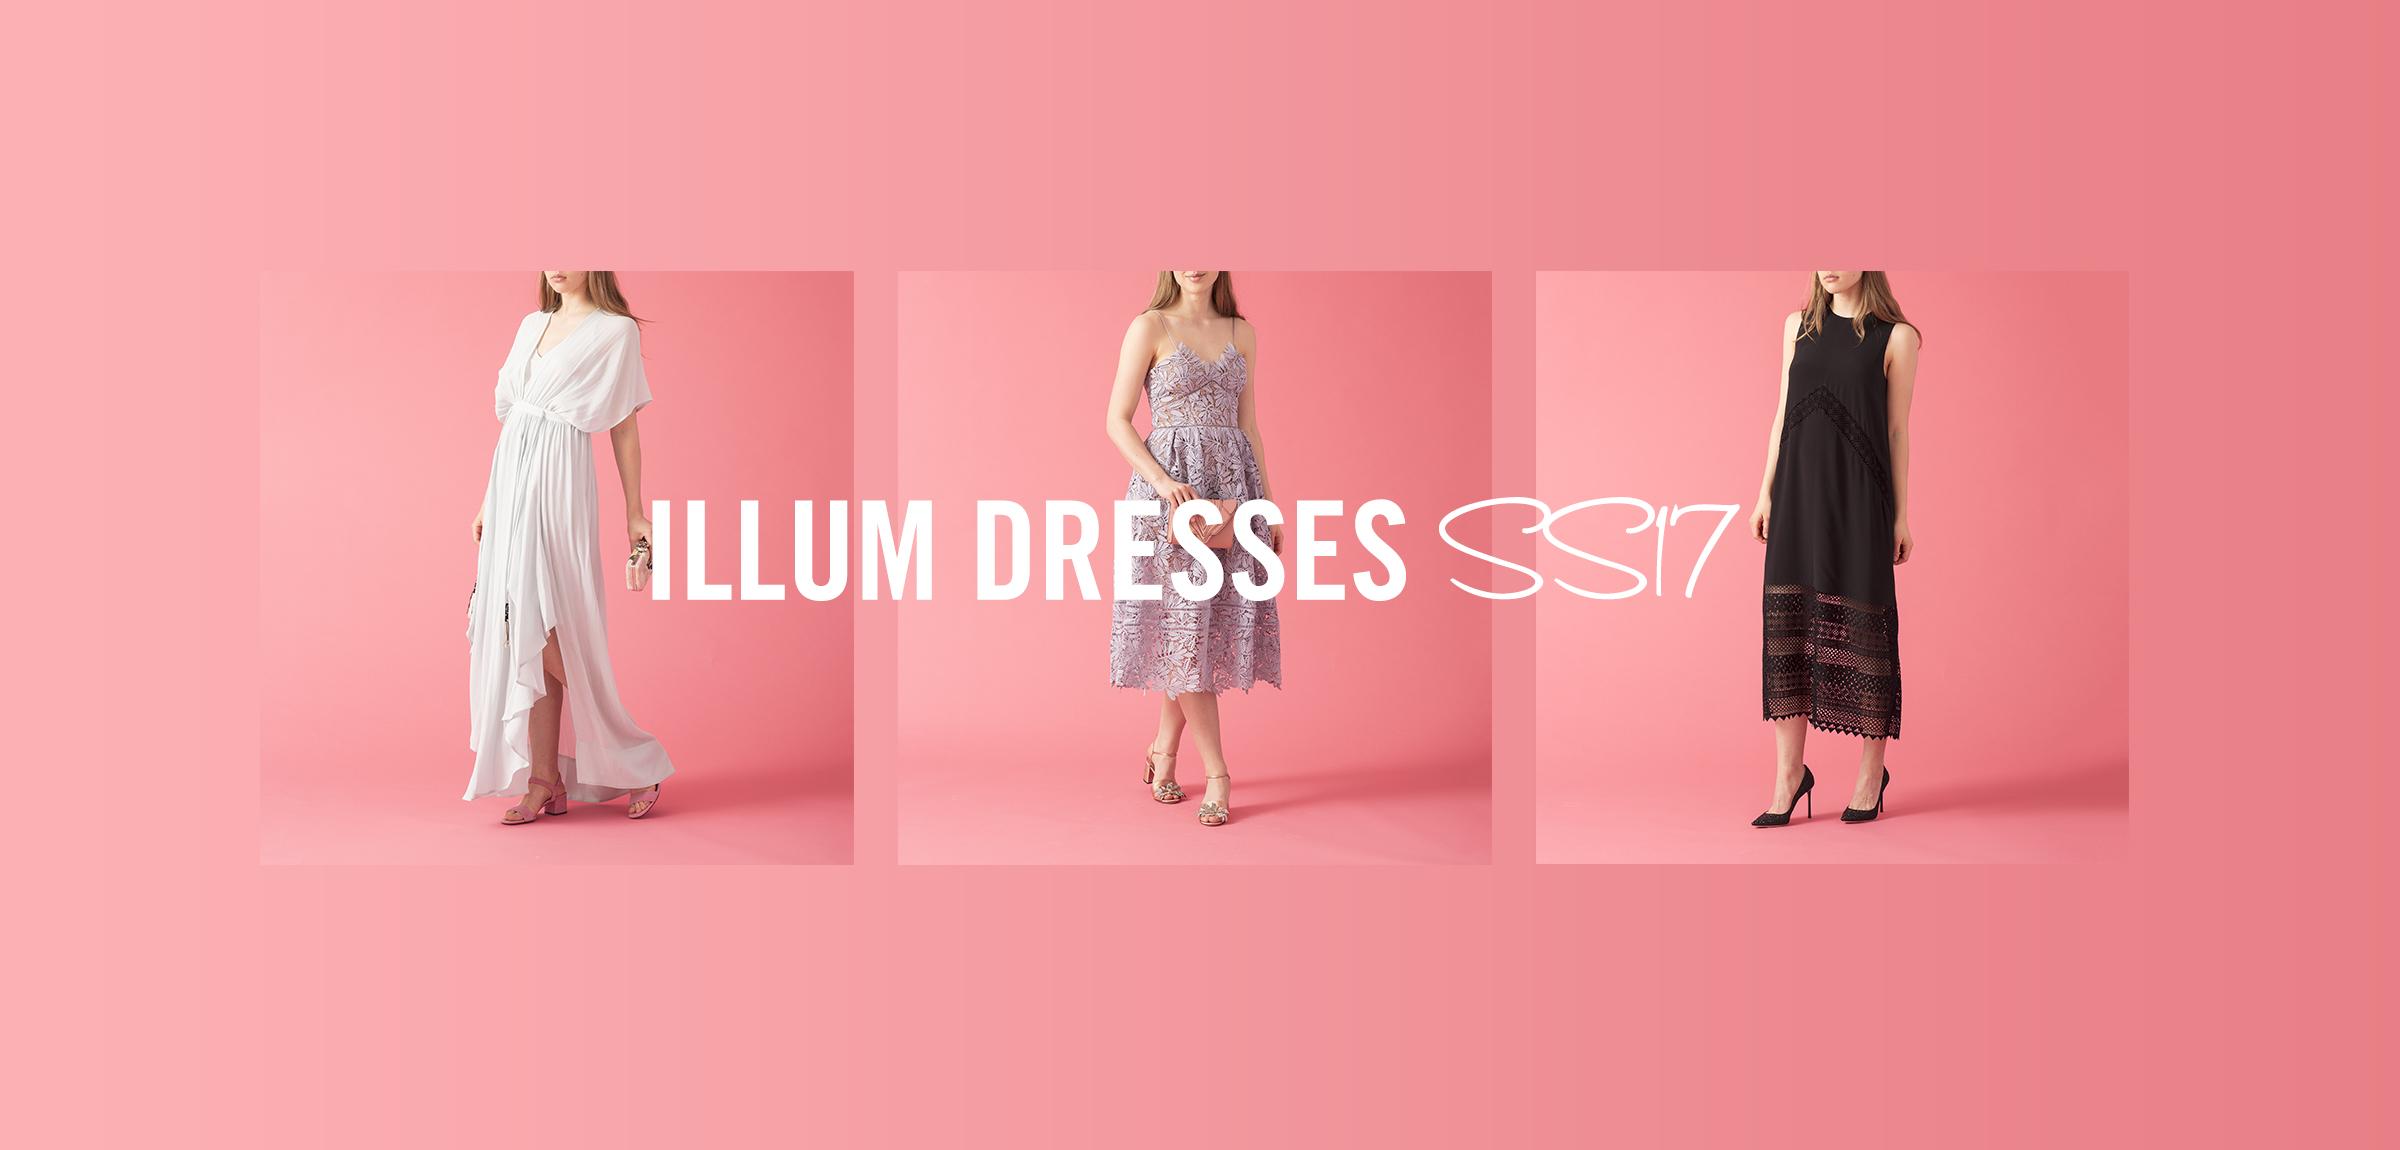 Dresses SS17